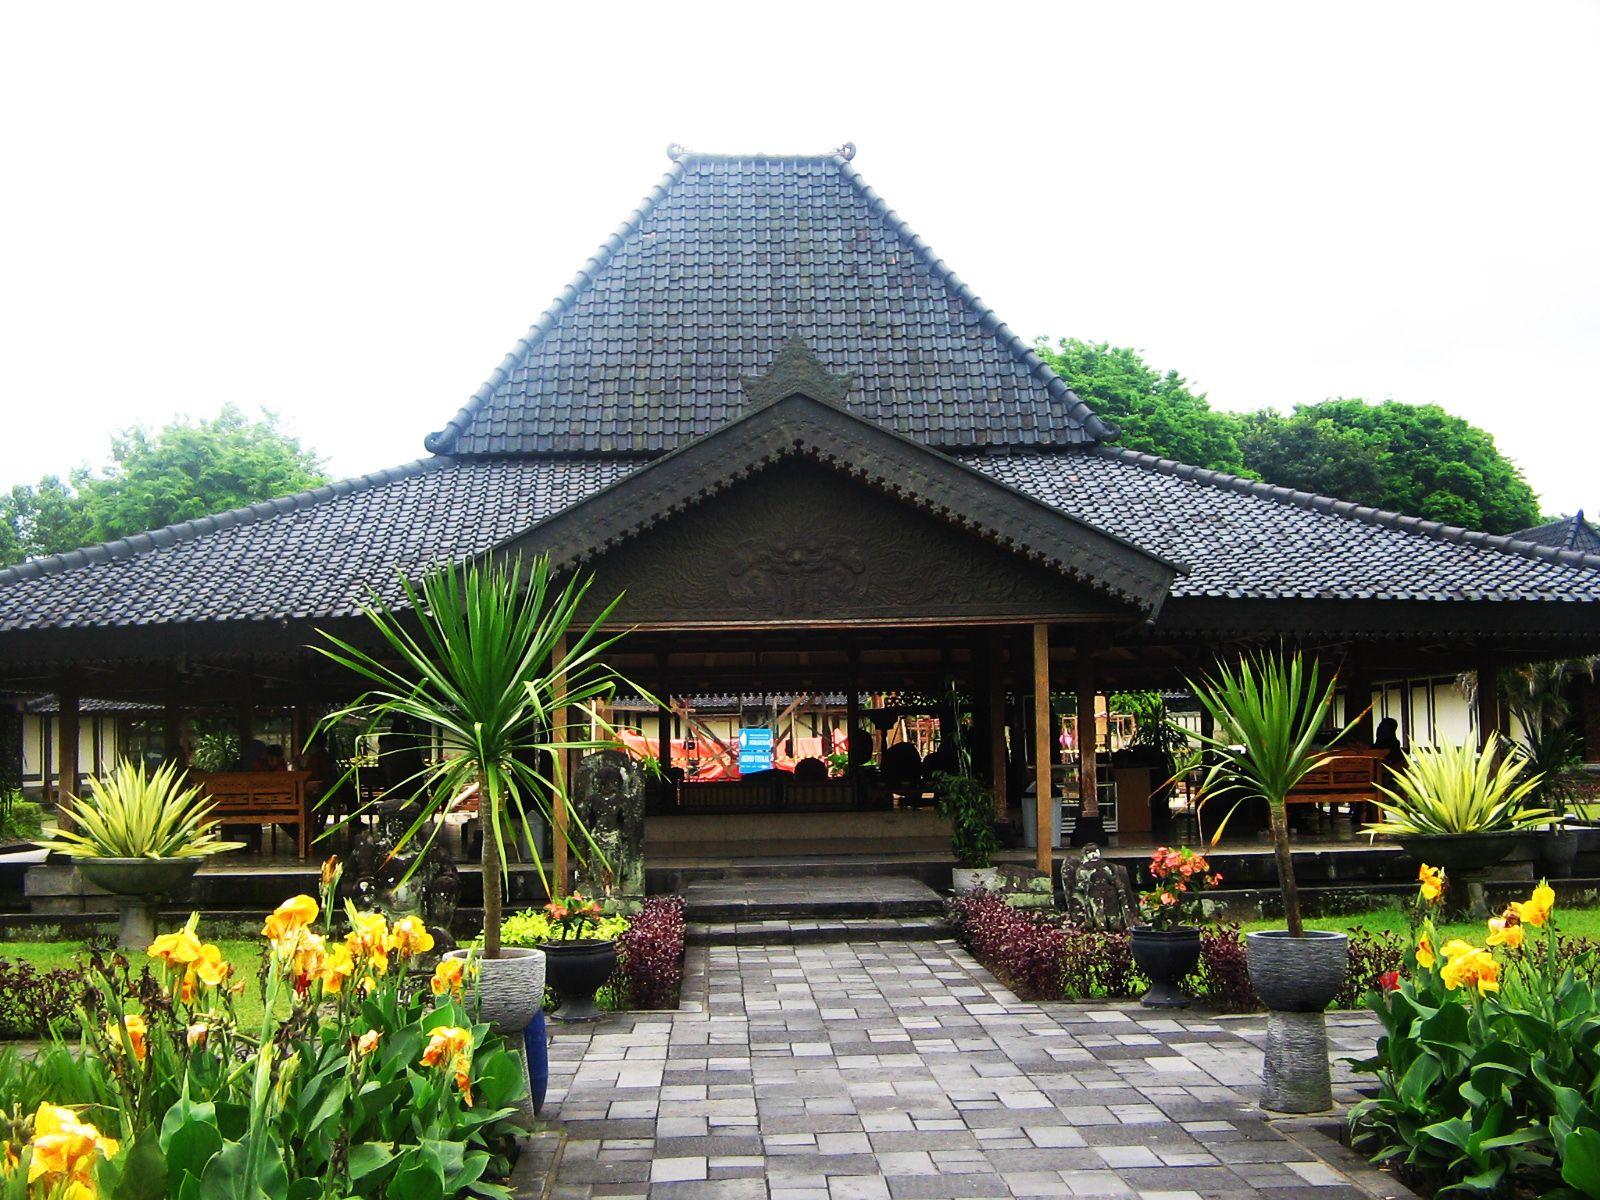 6200 Koleksi Gambar Rumah Joglo Bahan Bambu Gratis